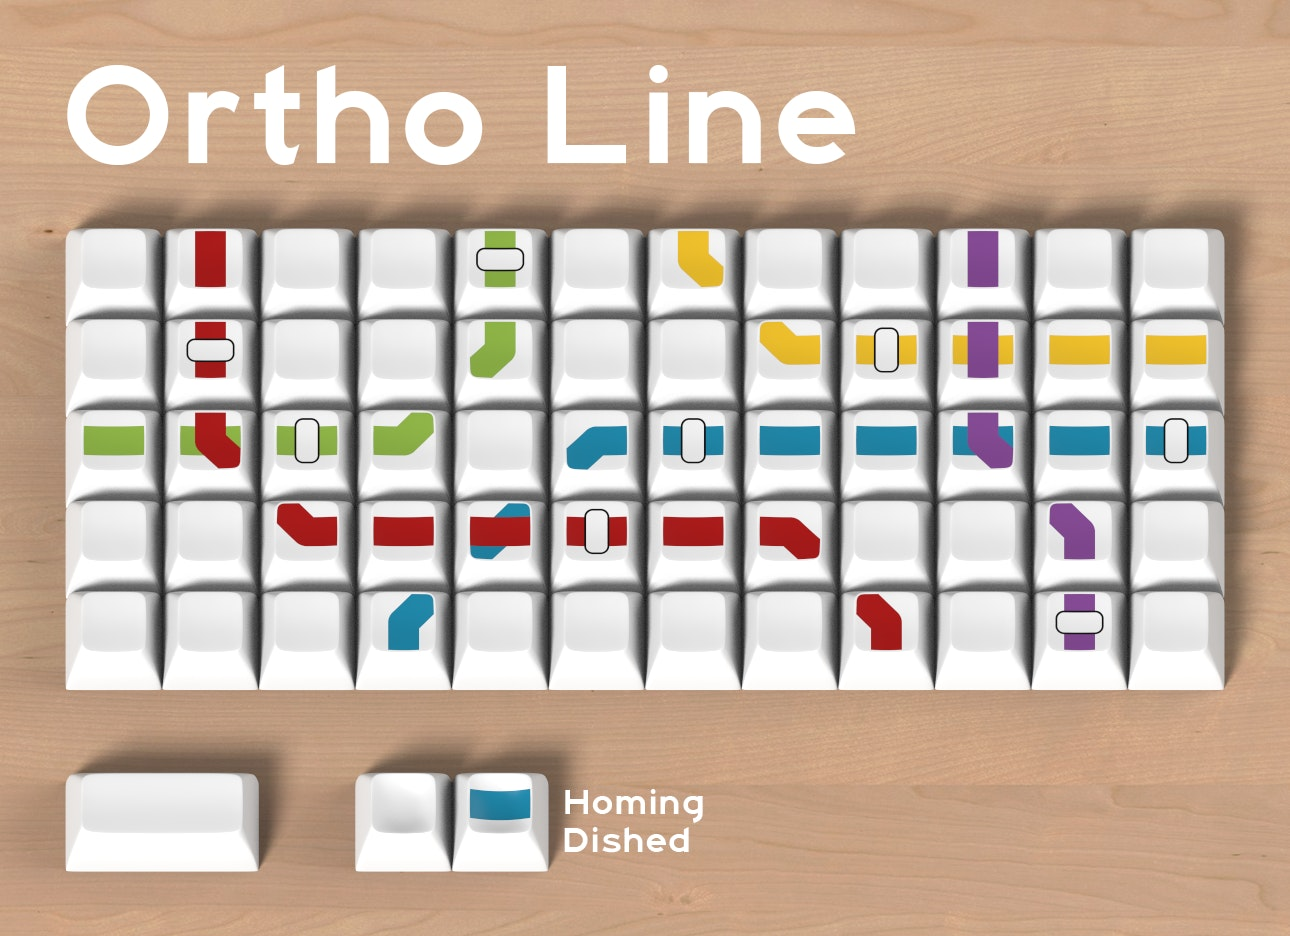 Ortho Line